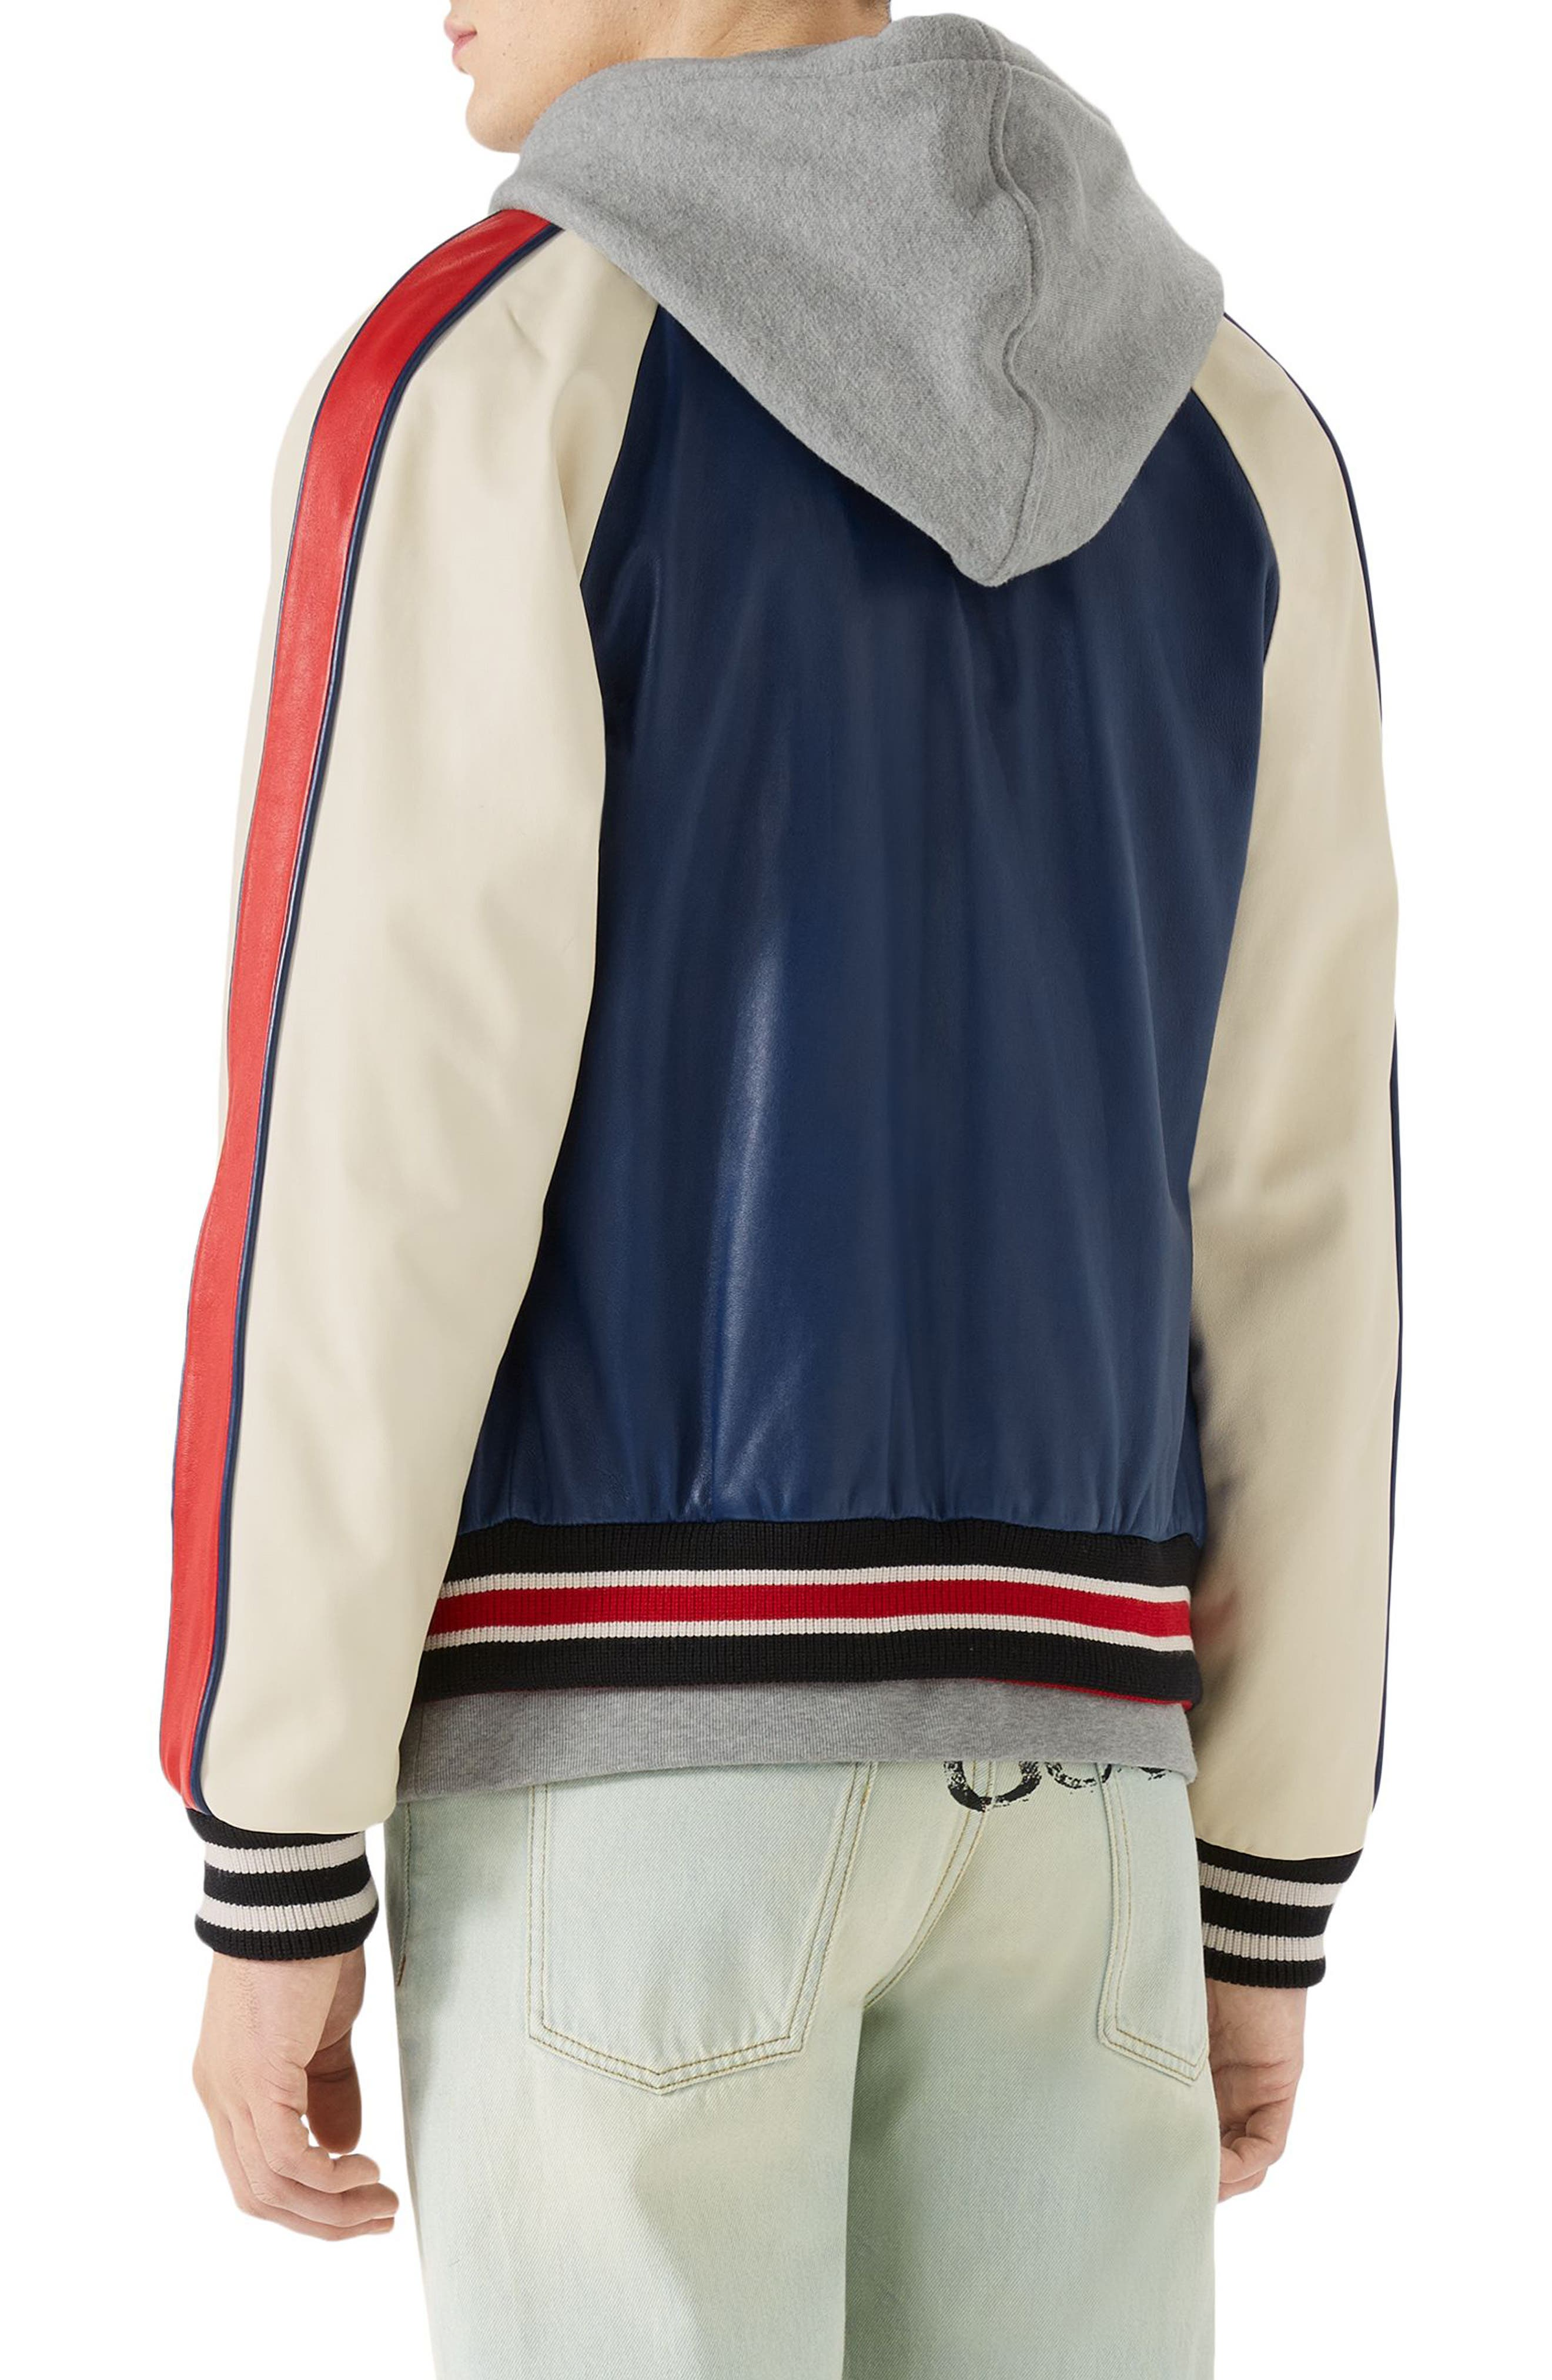 Multicolor Leather Bomber Jacket,                             Alternate thumbnail 2, color,                             Cobalt Blue